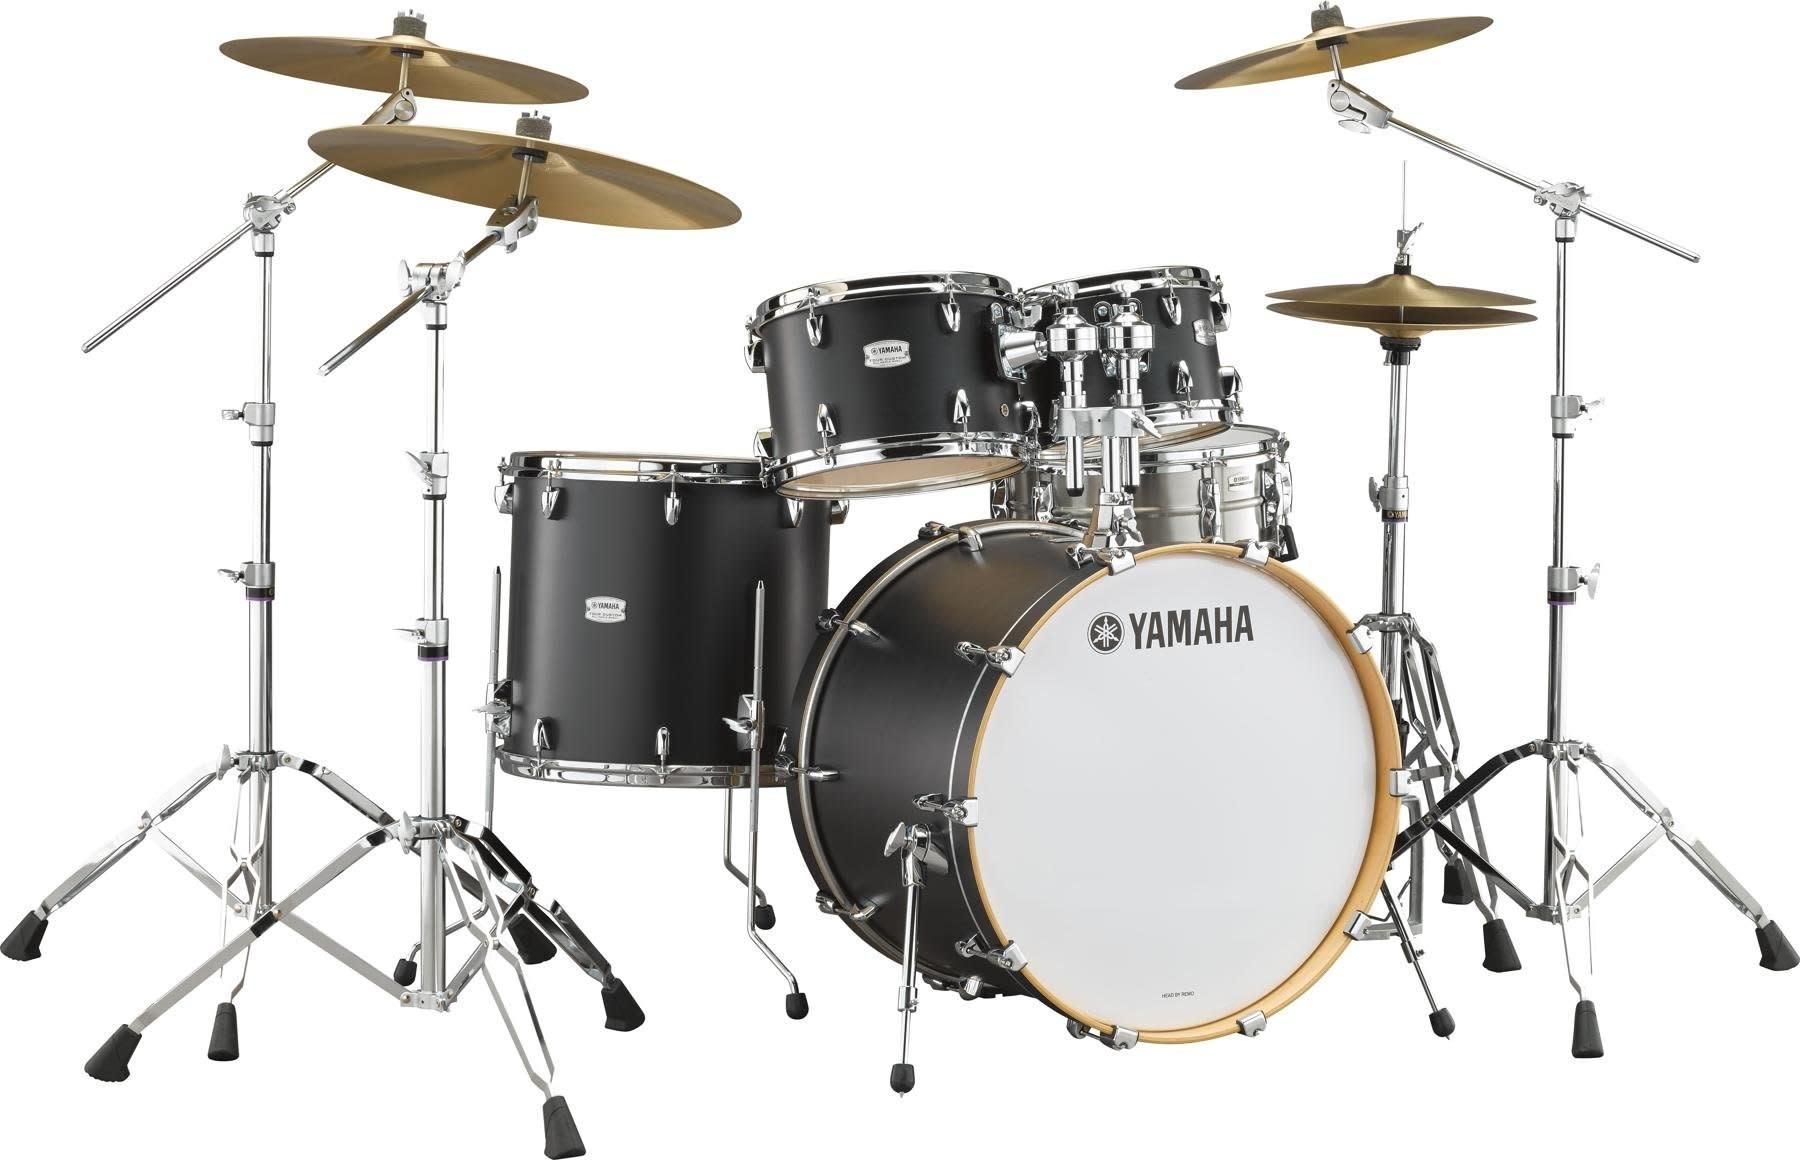 Yamaha Yamaha Tour Custom Drum Kit 20-10-12-14 + HW780 - Licorice Satin